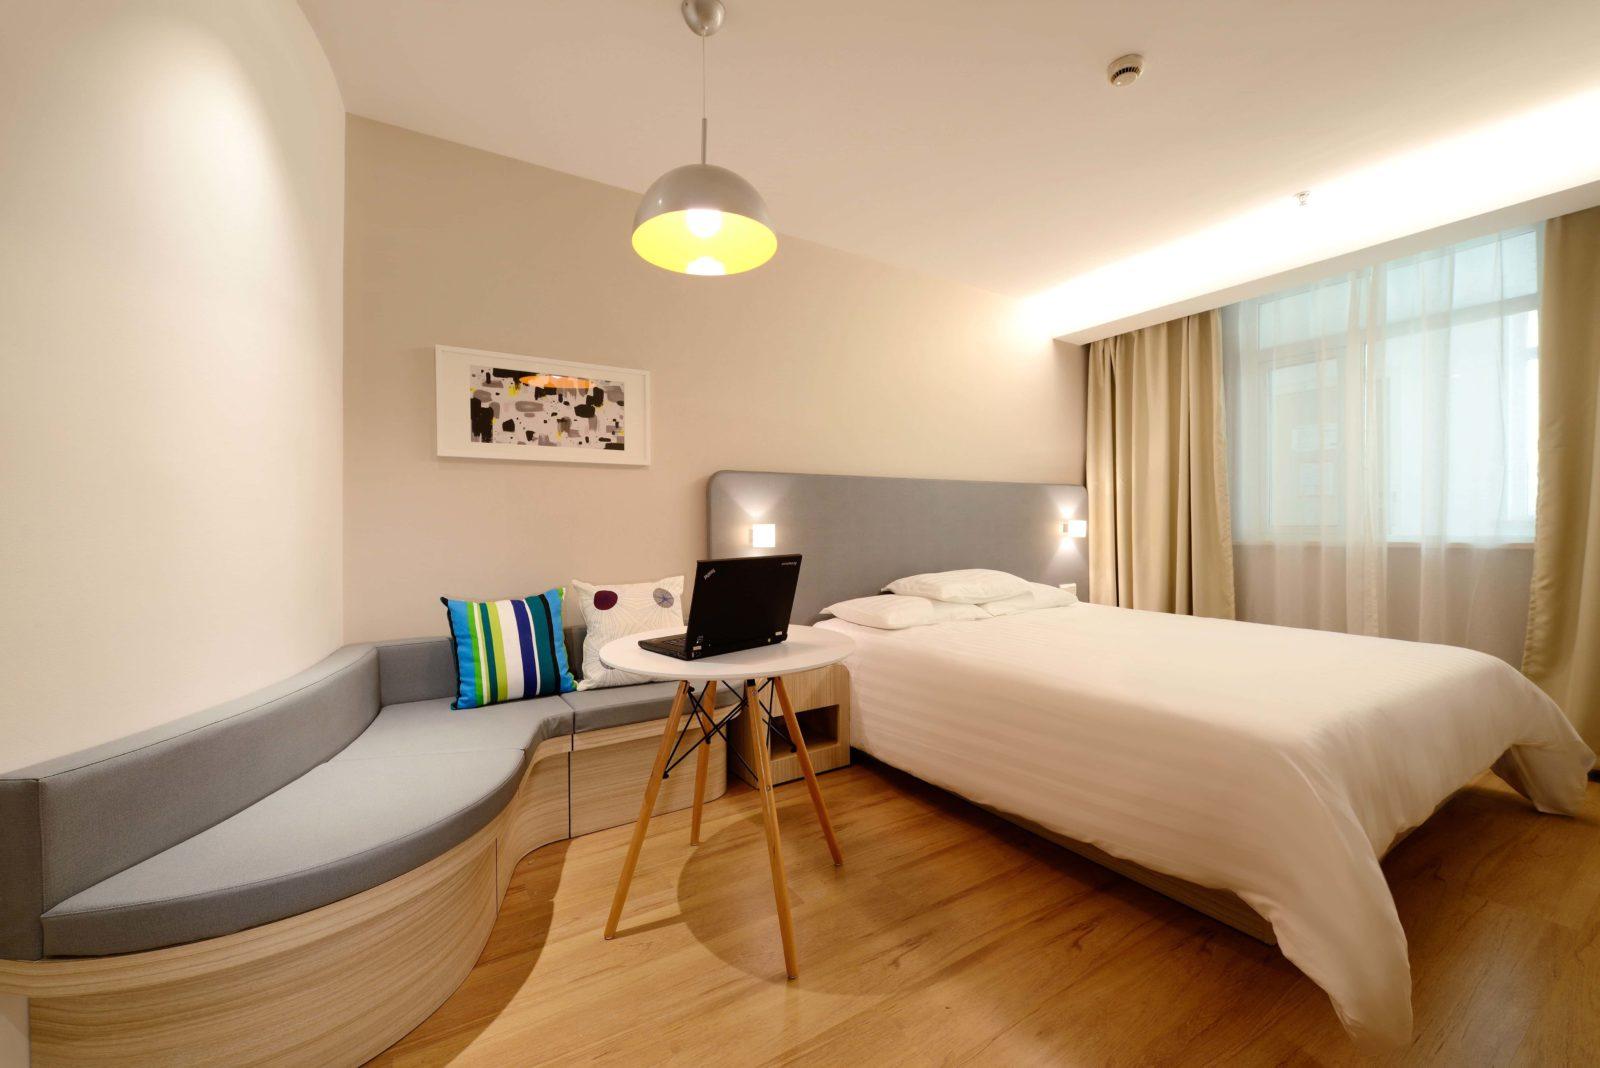 How to obtain instant elite hotel status